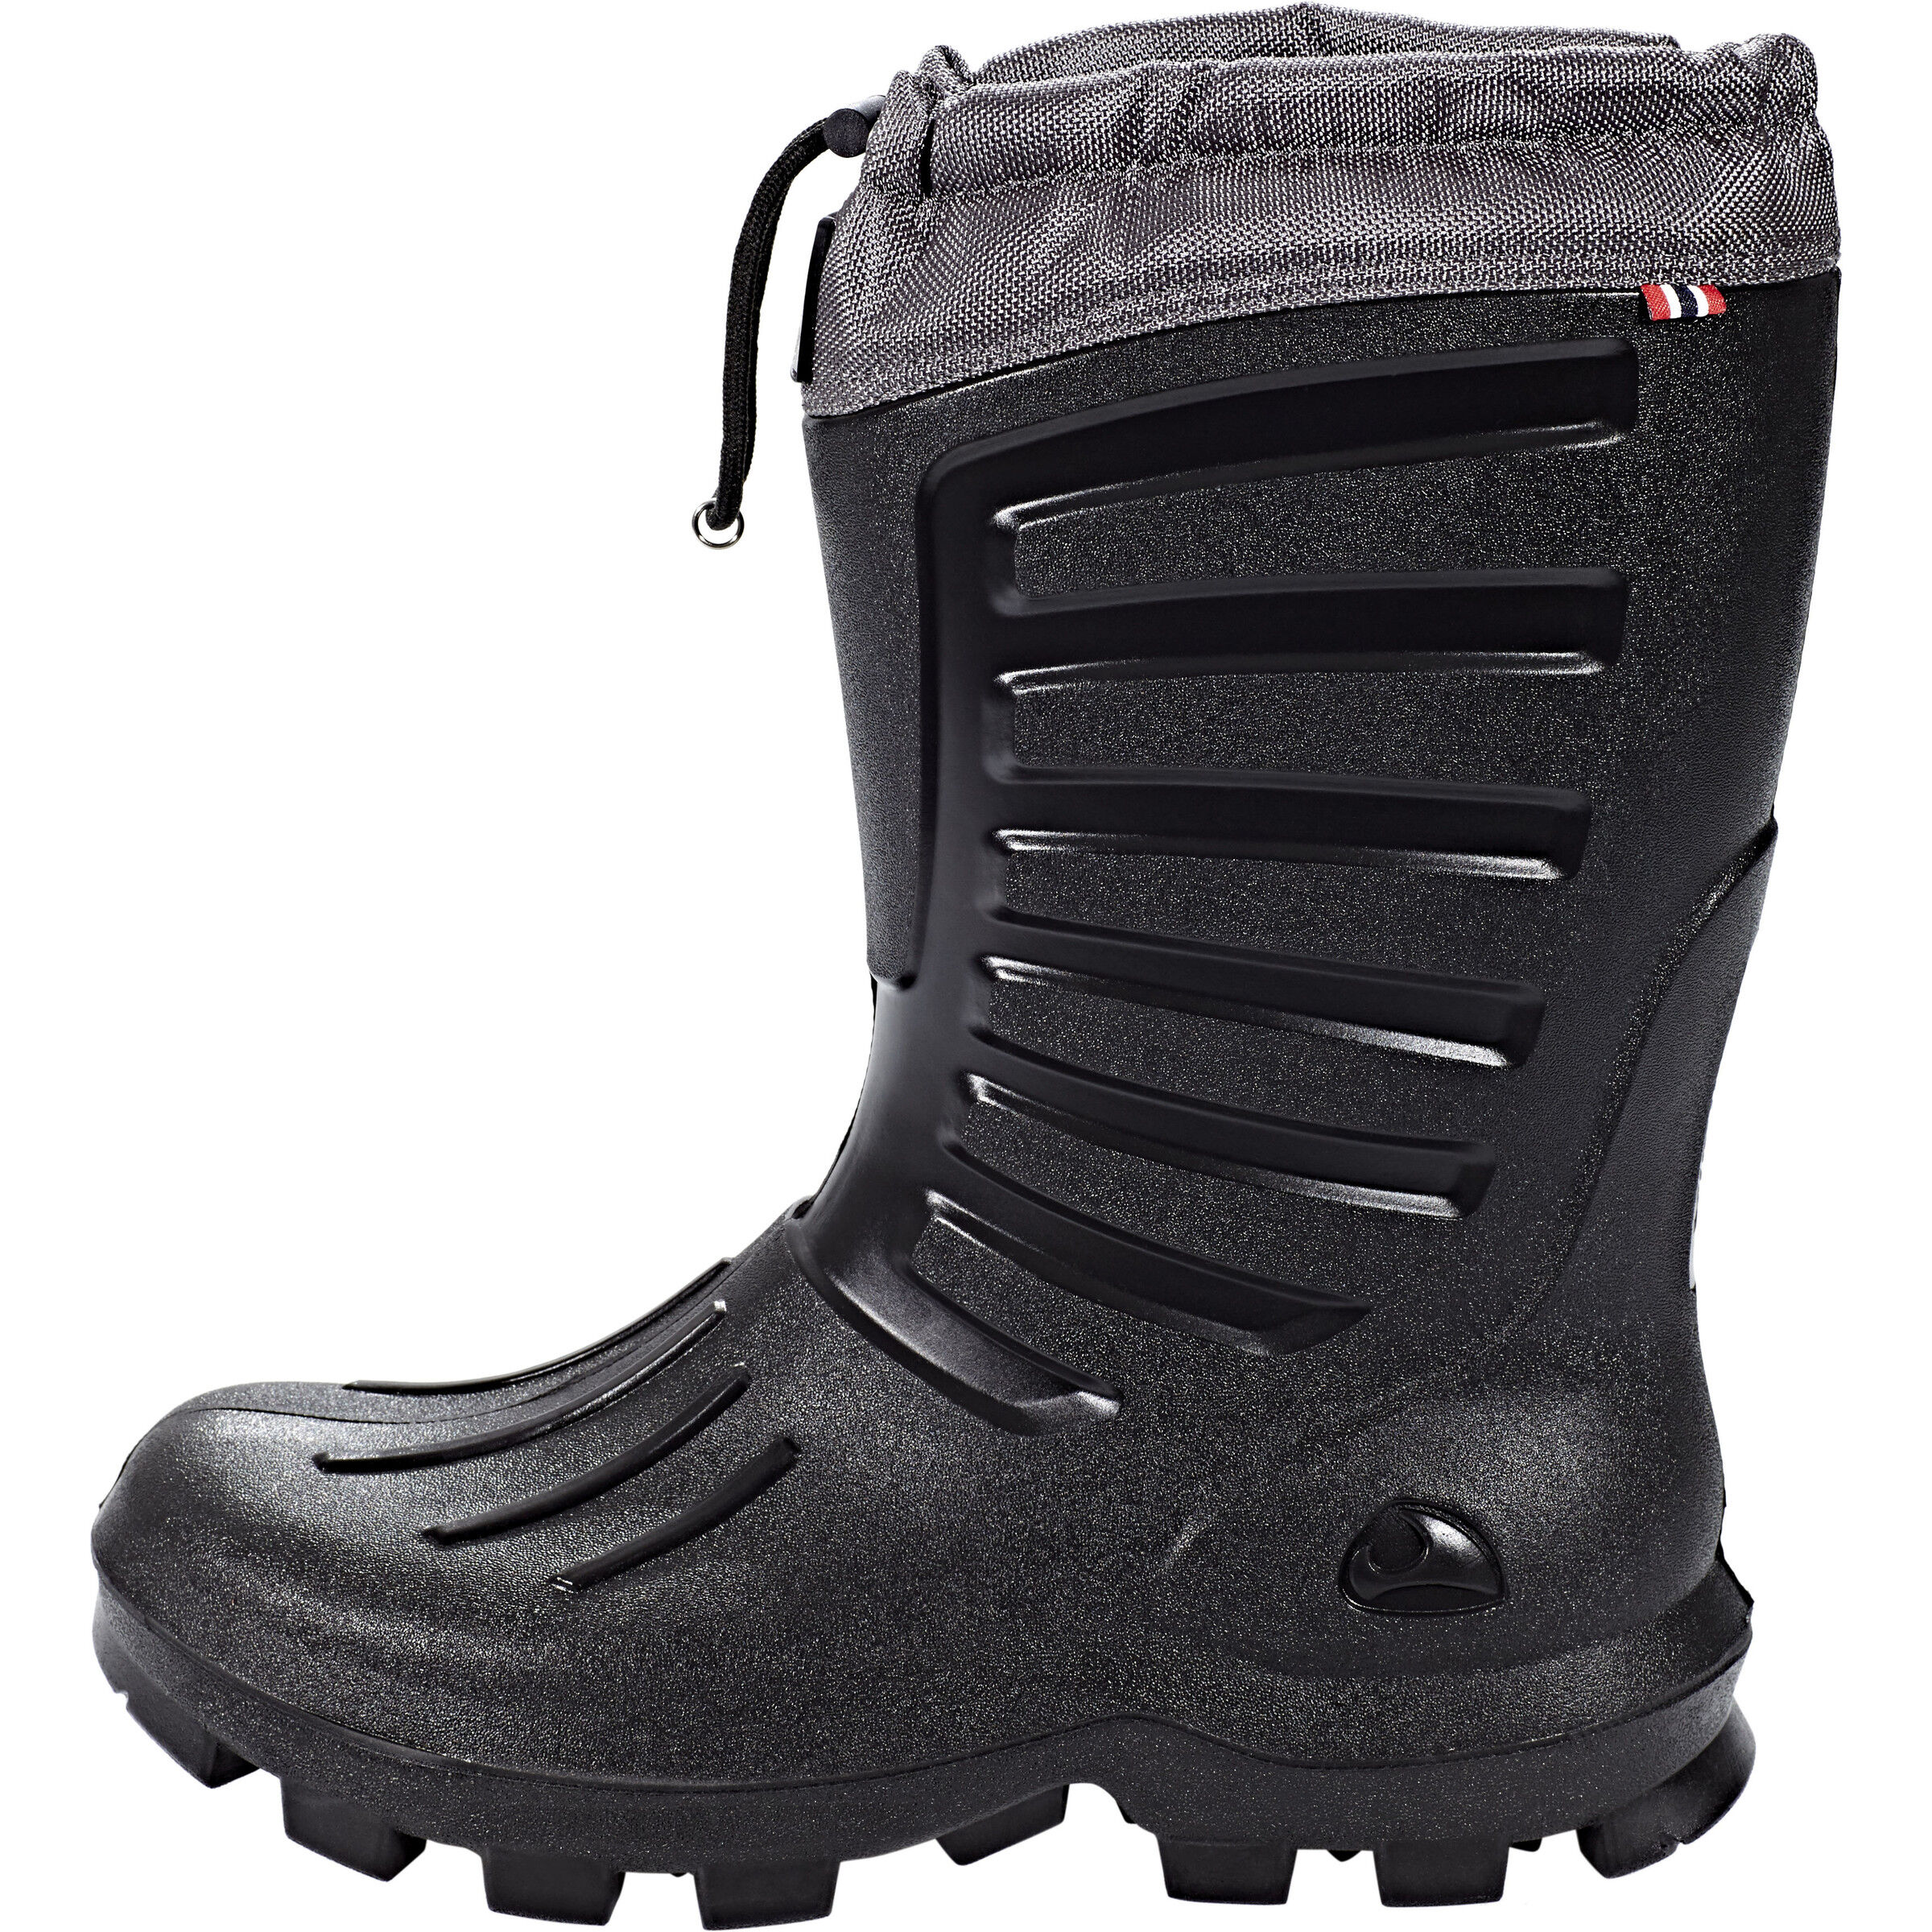 Footwear Viking 2 Boots Blackdark 0 Arctic Grey 3ALR54jq